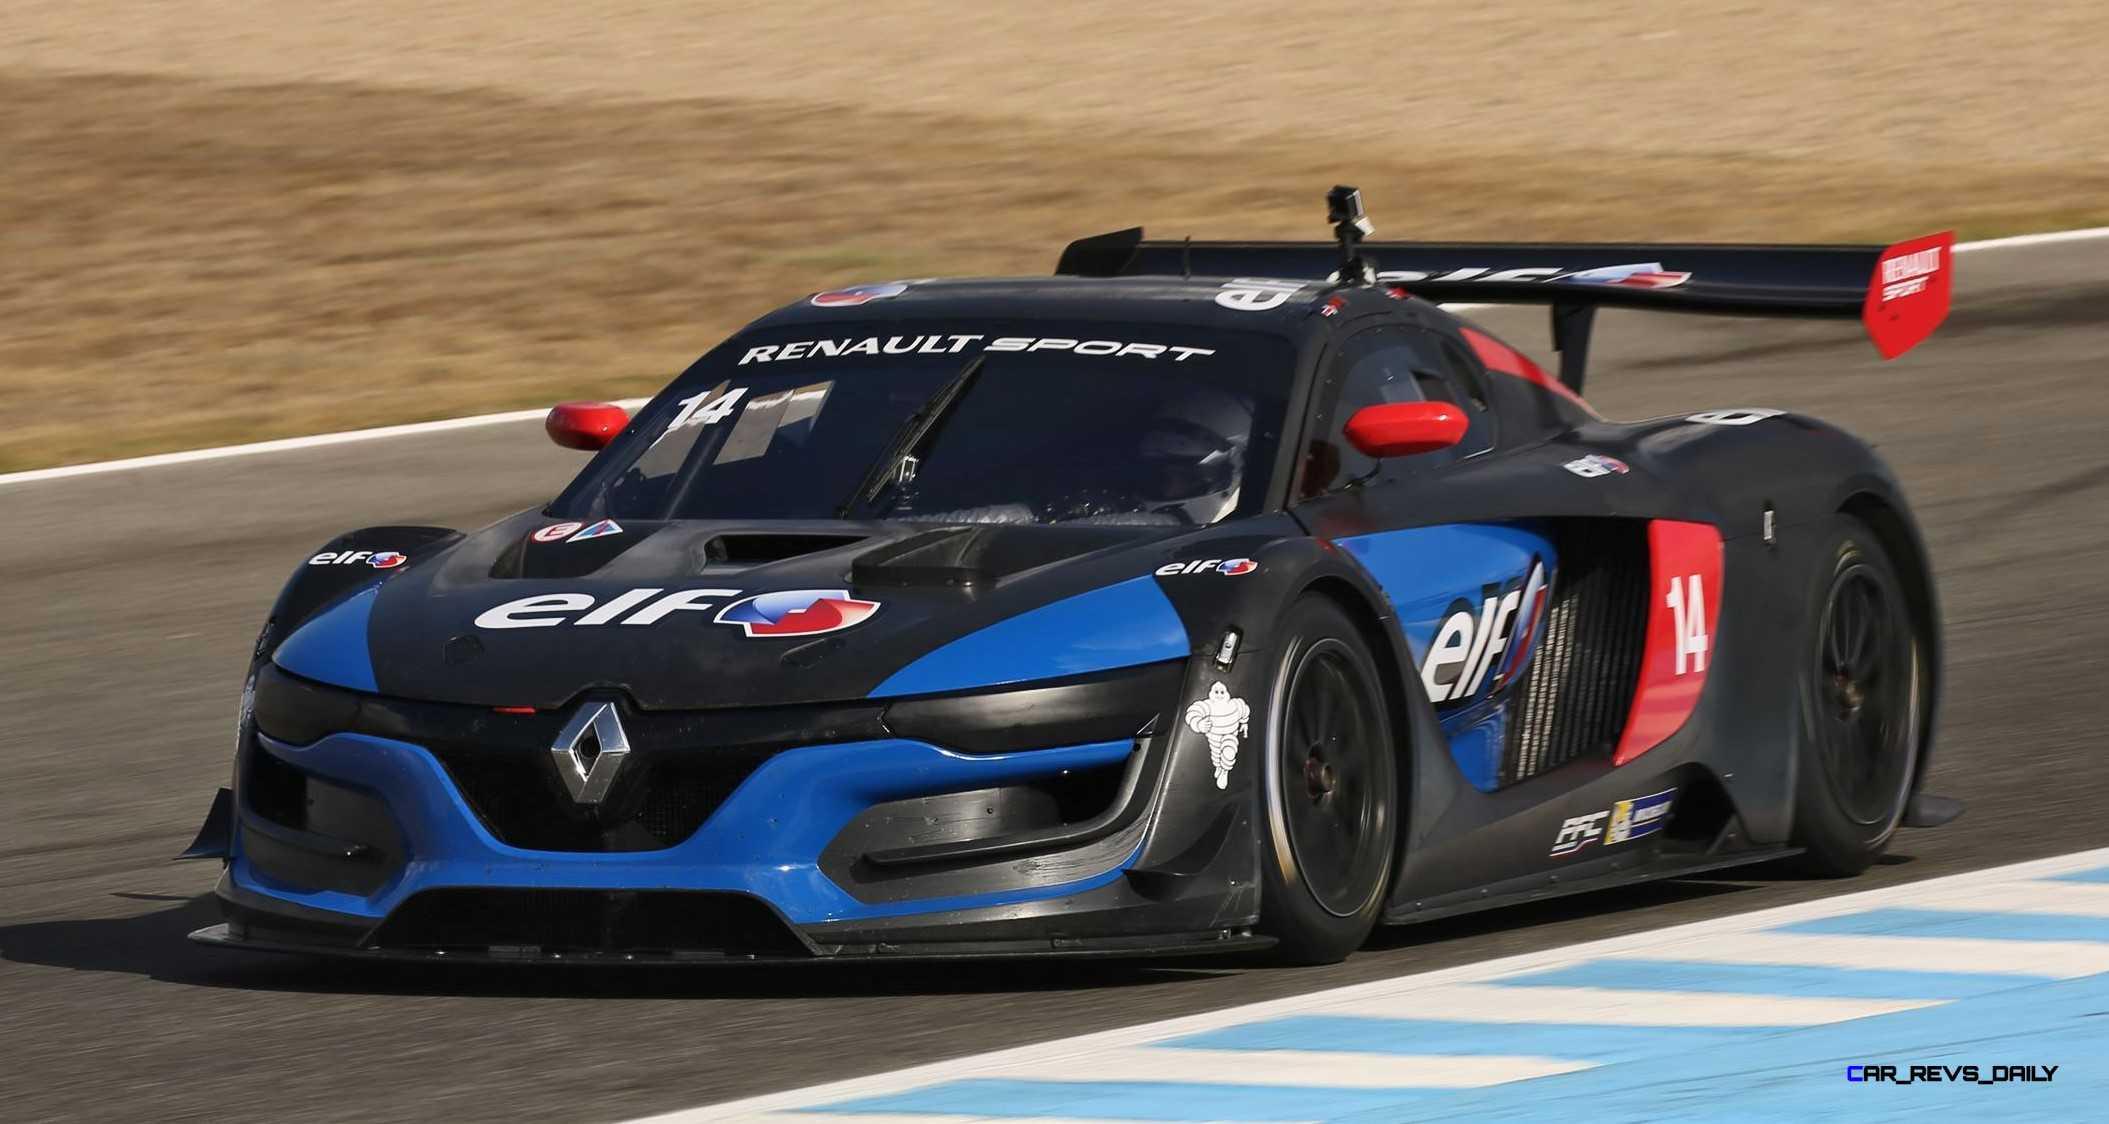 2015 Renaultsport Rs01